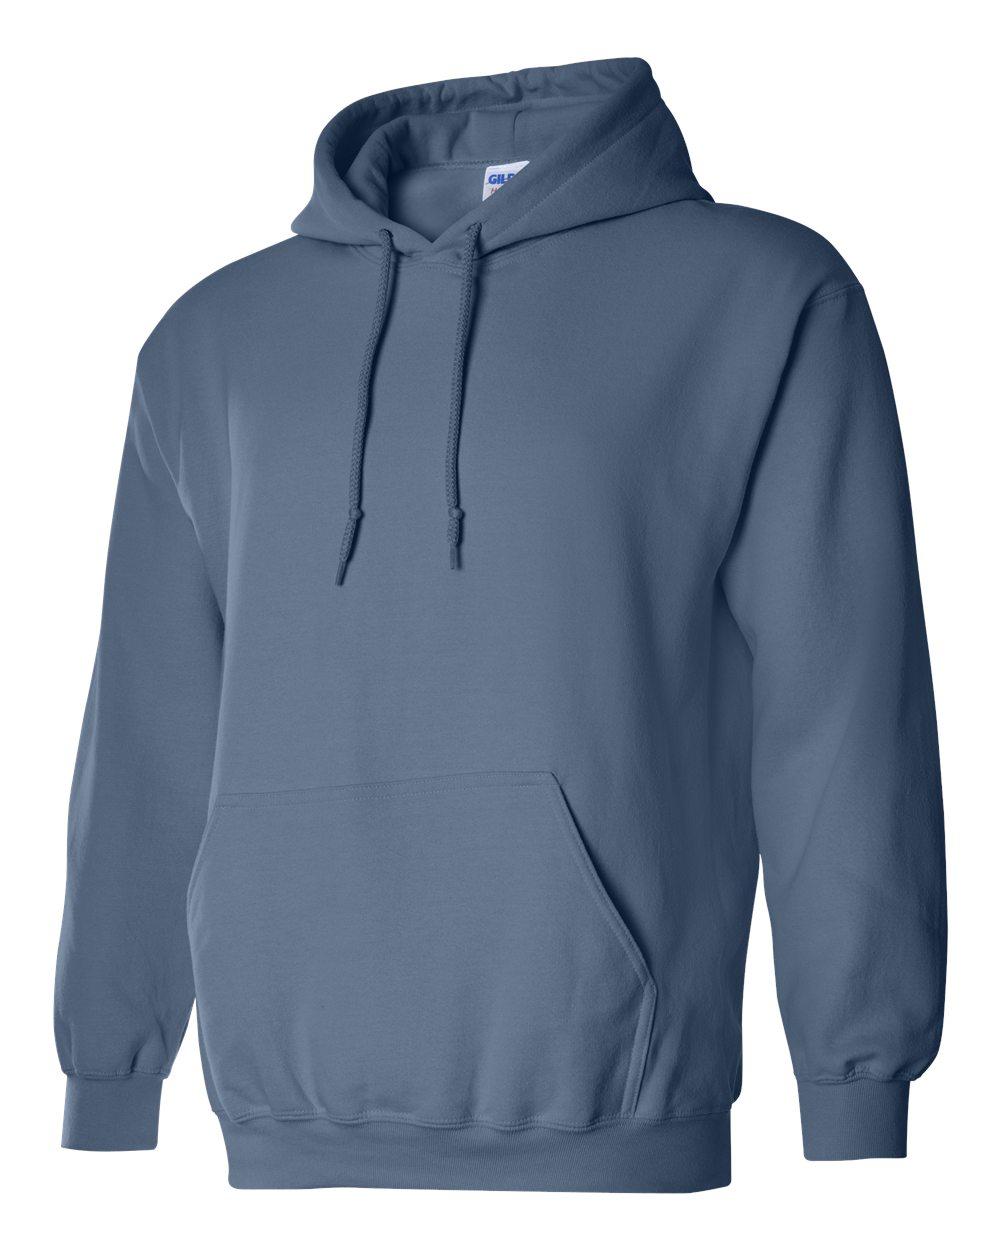 Gildan Heavy Blend Hooded Sweatshirt GI18500 Indigo Blue